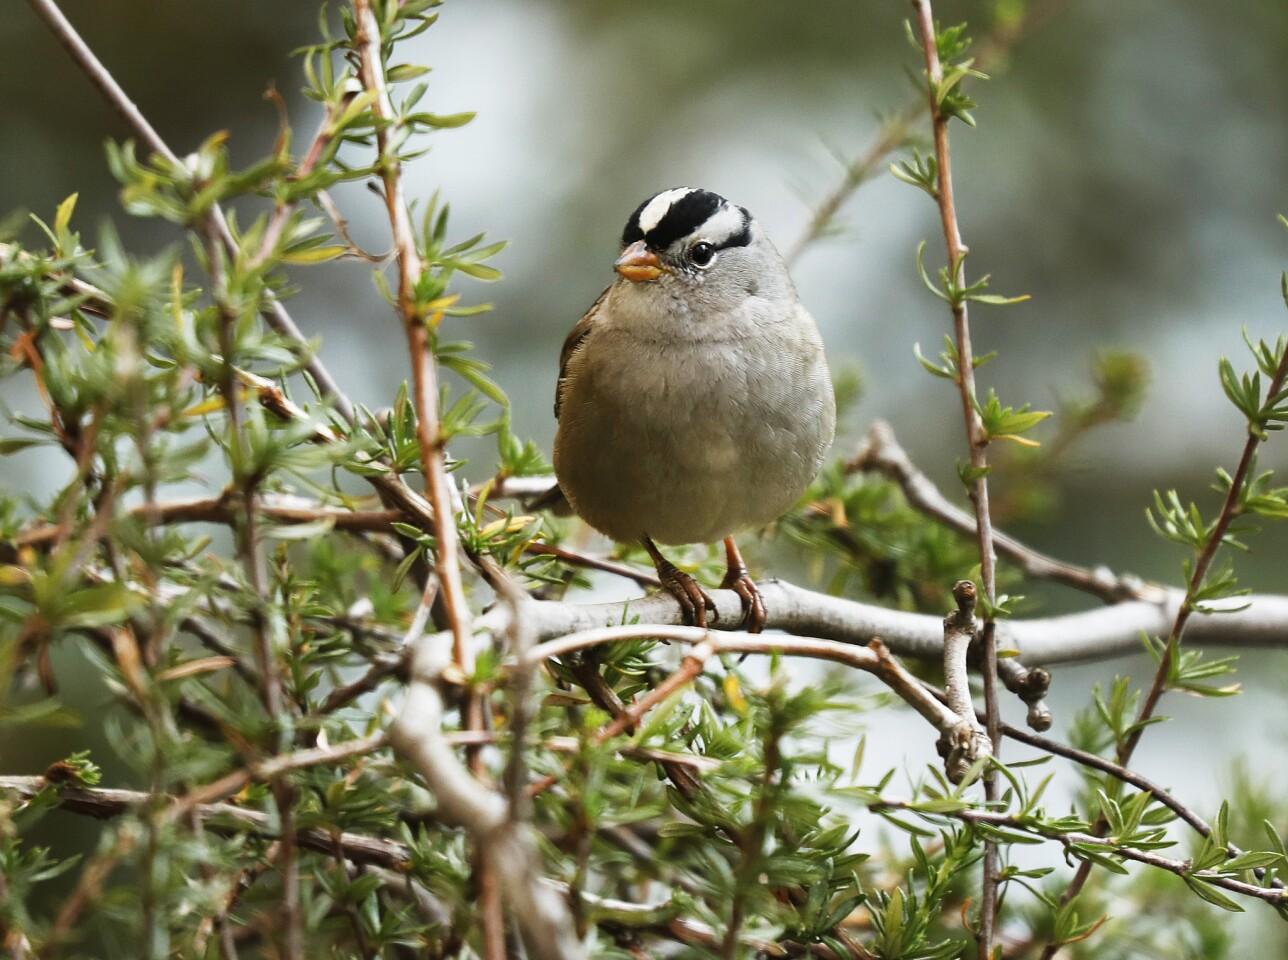 Planting a bird-friendly garden